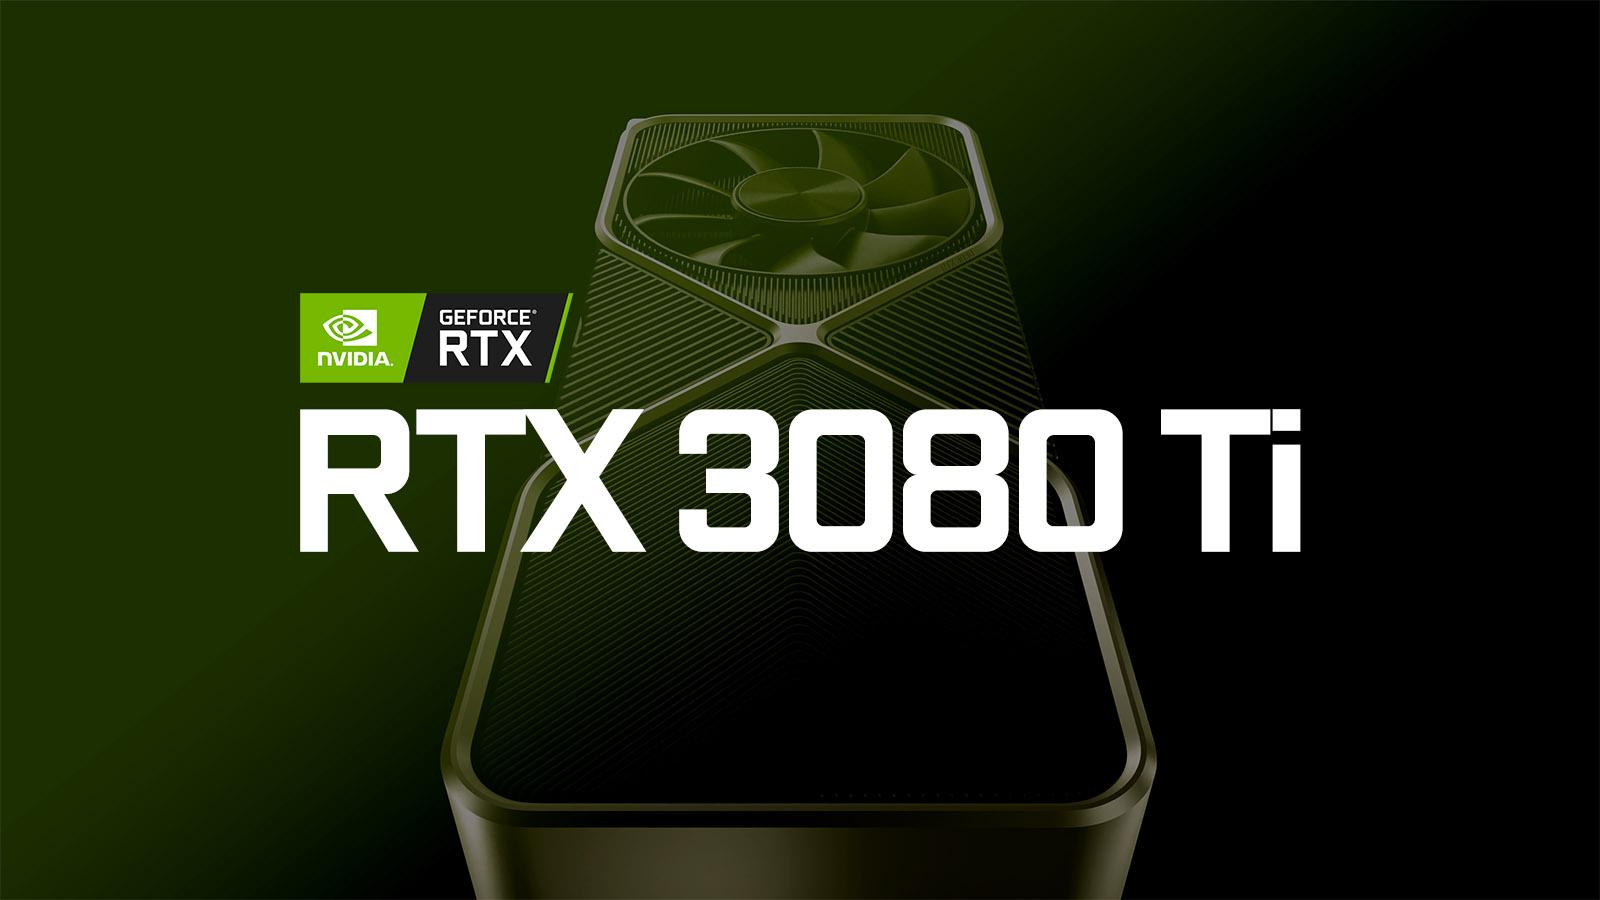 NVIDIA ประกาศไลฟ์สตรีมวันจันทร์หน้า คาดเปิดตัว 3070 Ti กับ 3080 Ti ตามข่าวลือ